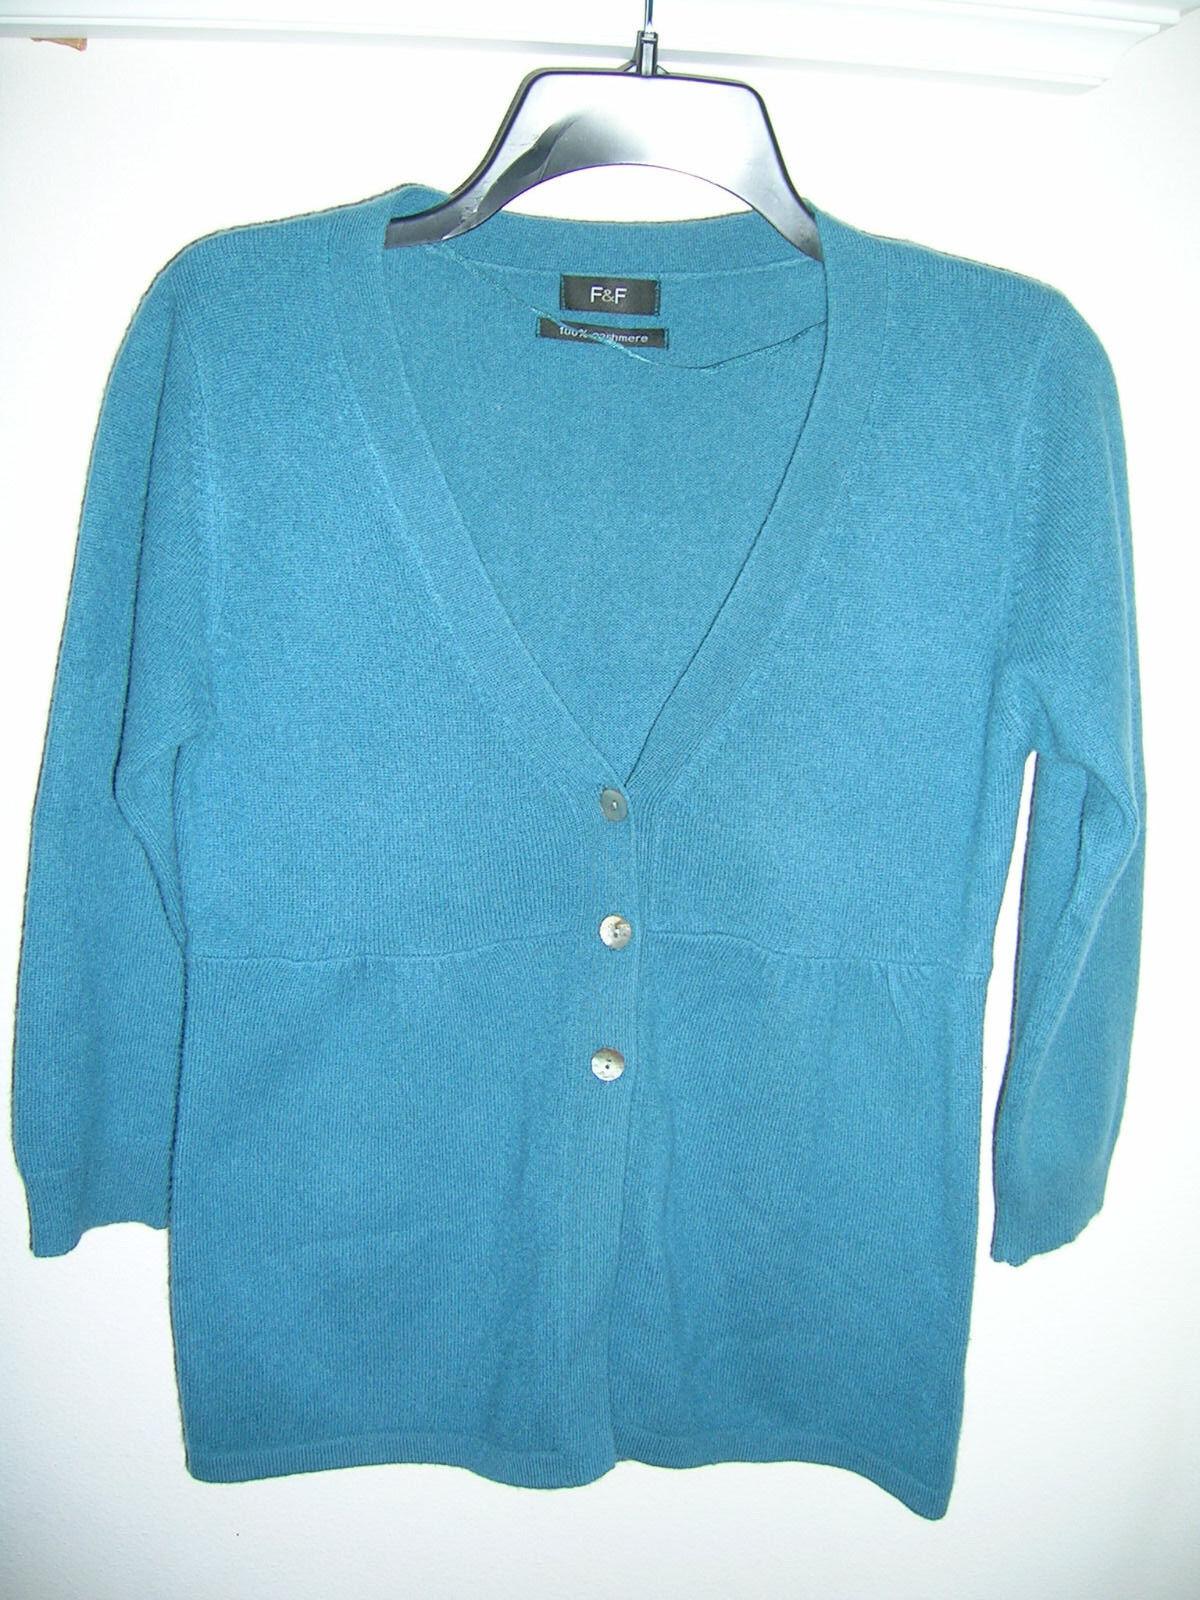 F & F 100% Cashmere Teal Empire Waist 3 Button Cardigan Knit Sweater - sz 10 S M